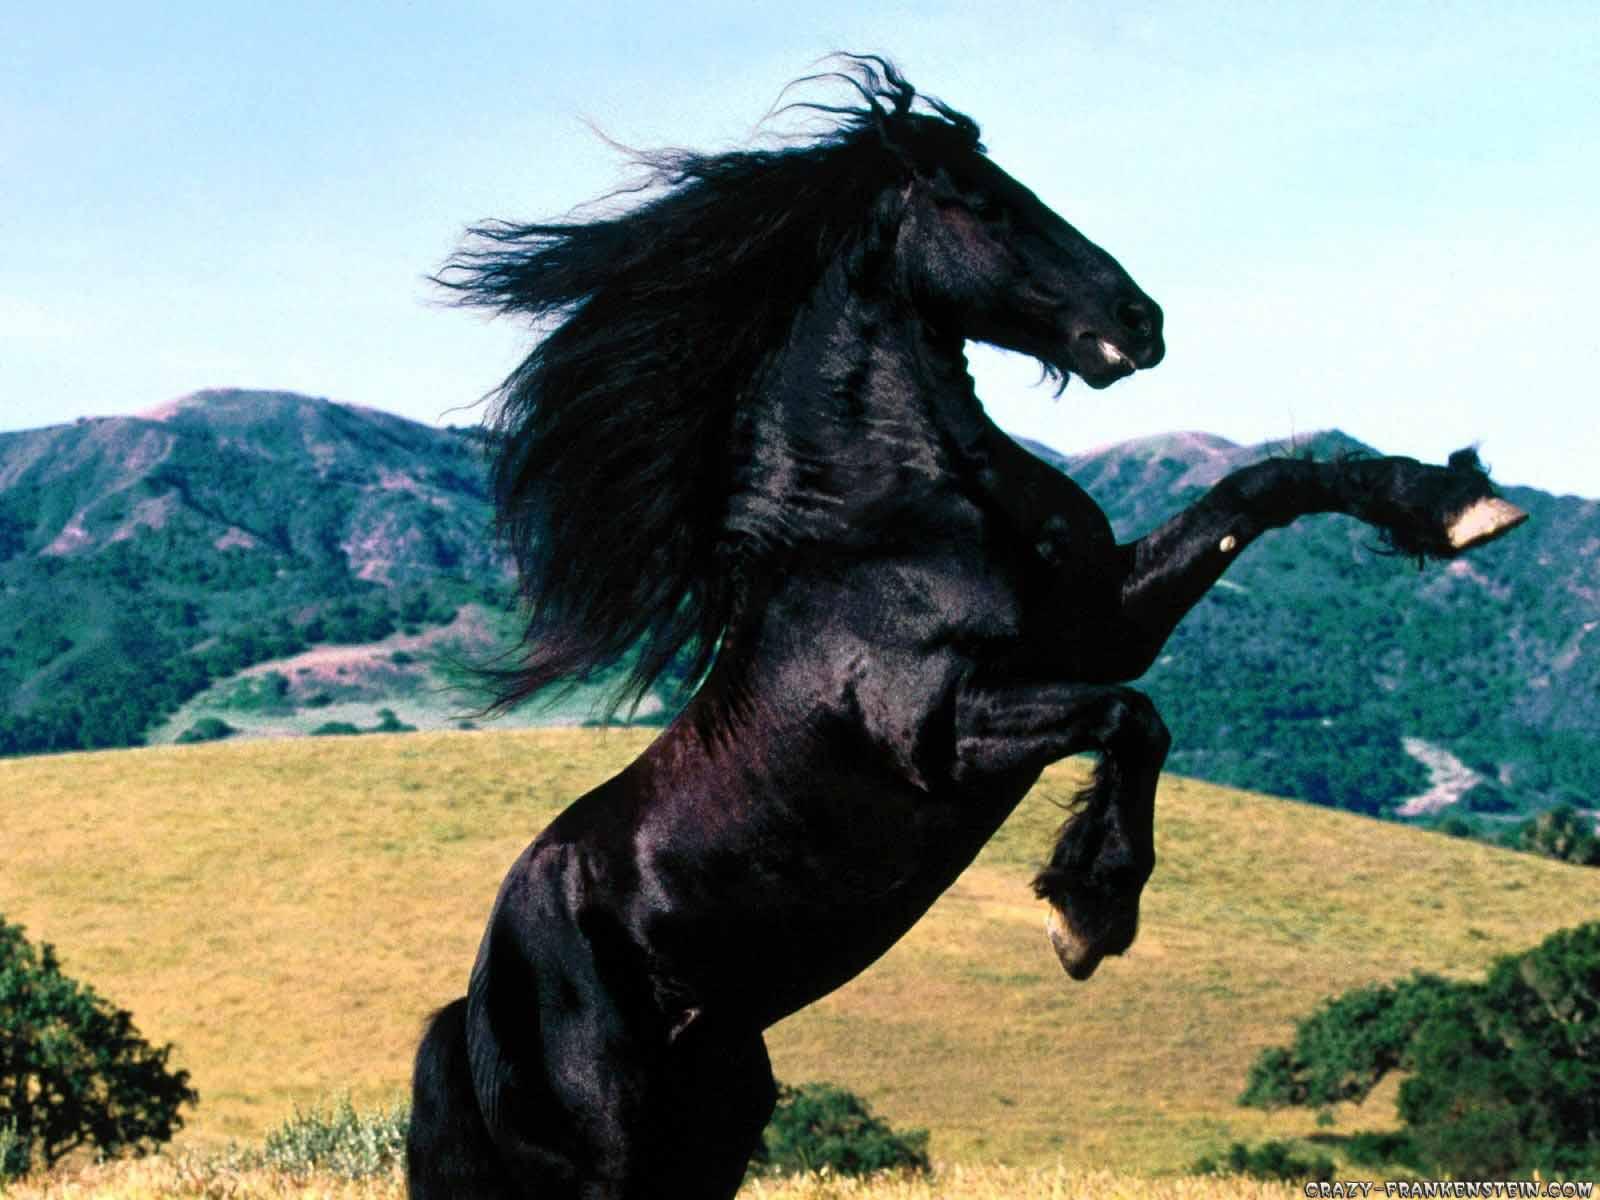 Beautiful Black Horse Hd Wallpapers 2012 1600x1200